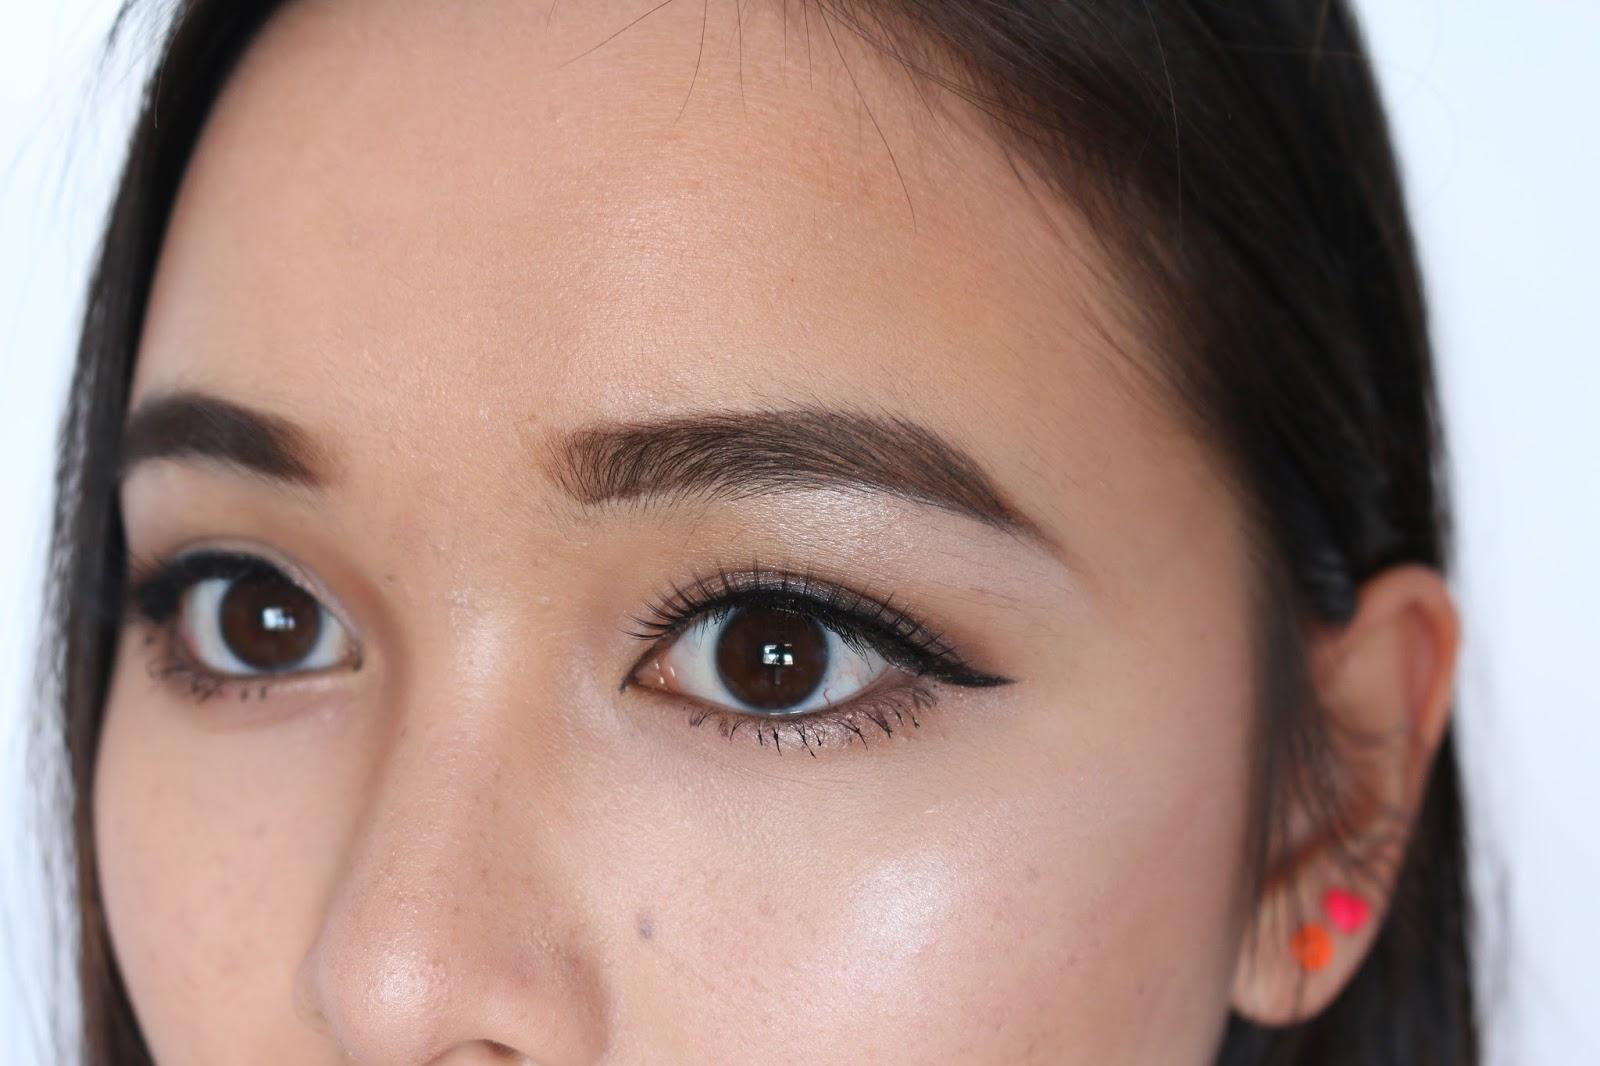 How To Apply False Eyelashes 1000hr Eyelash Review H E Y L I N N I